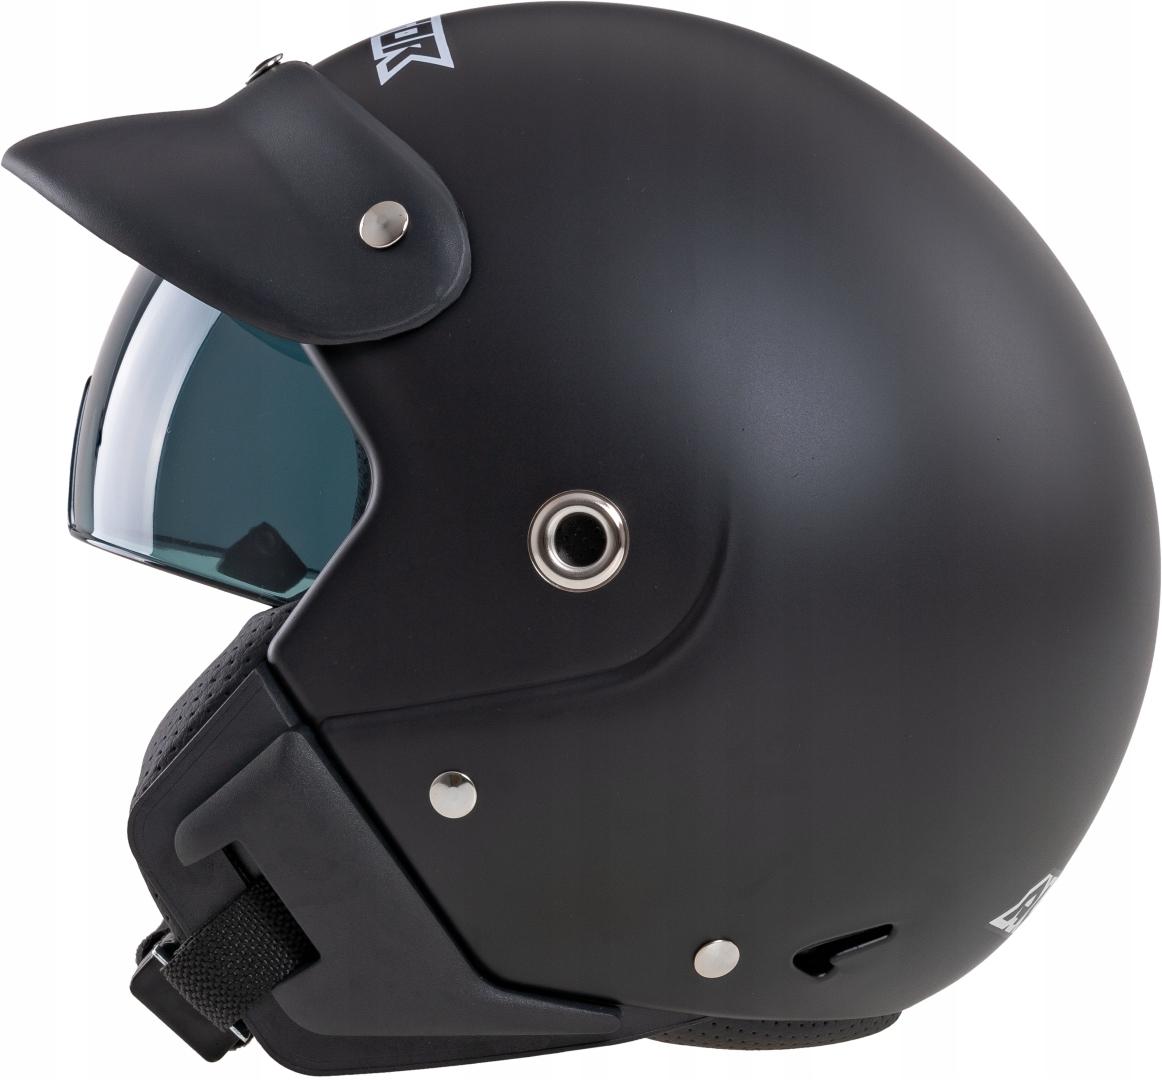 KASK MOTOCYKLOWY OTWARTY MOTOR SKUTER BLENDĄ ST M